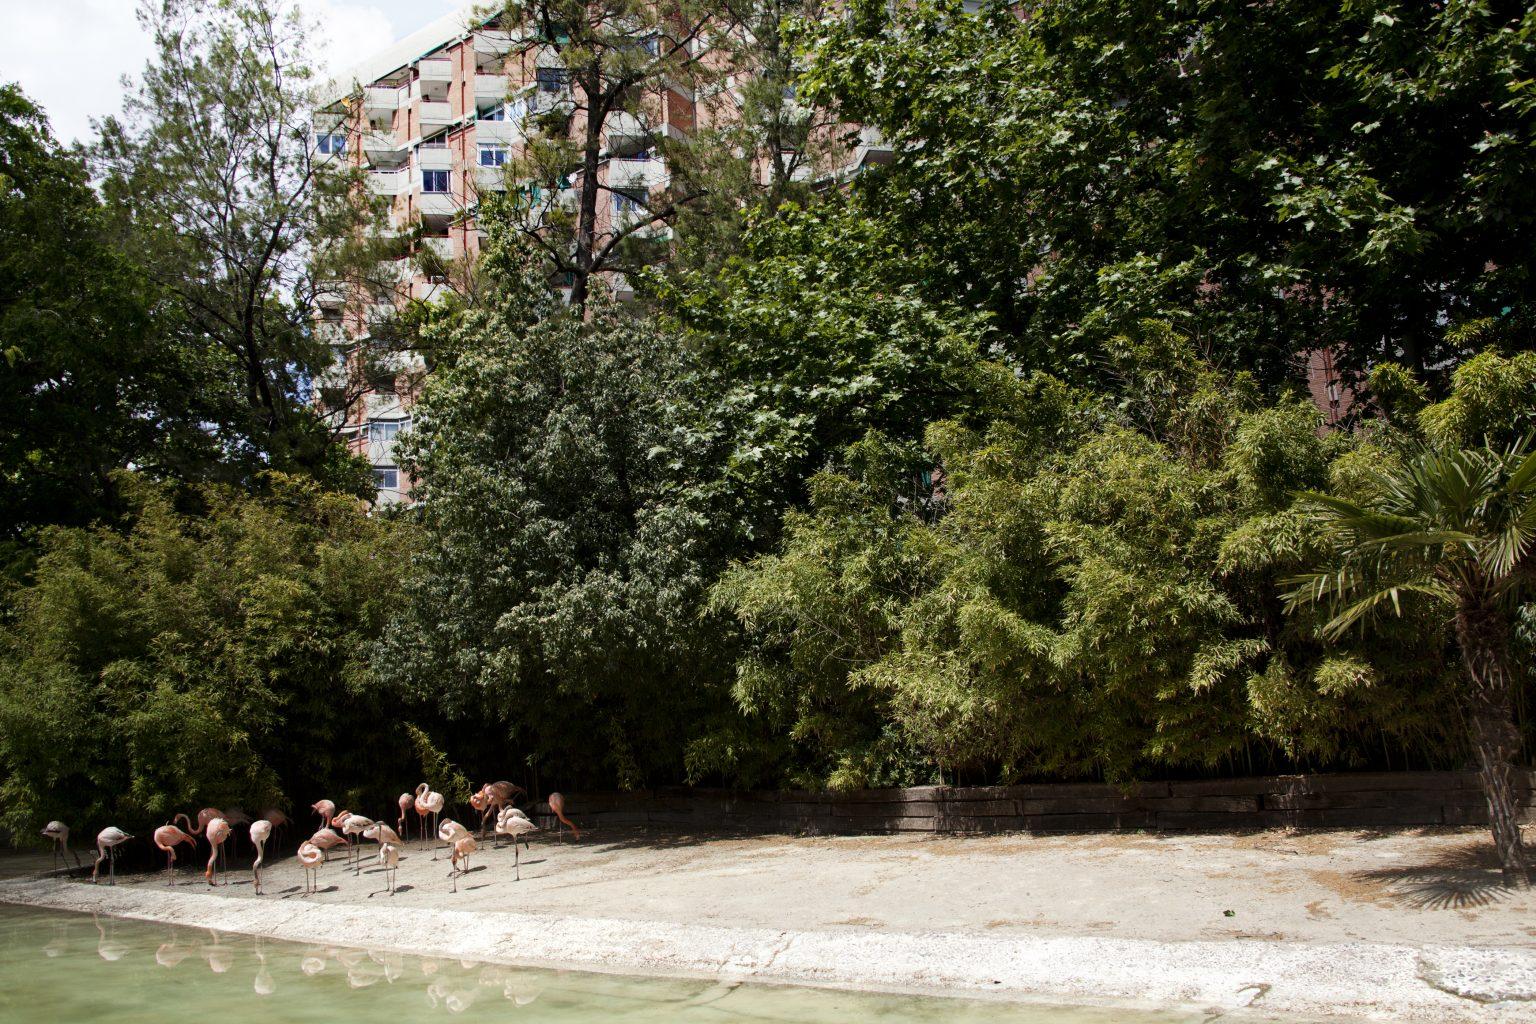 Barcelona, May 2013 - zoological garden, common flamingos. >< Barcellona, maggio 2013 - giardino zoologico, fenicotteri.